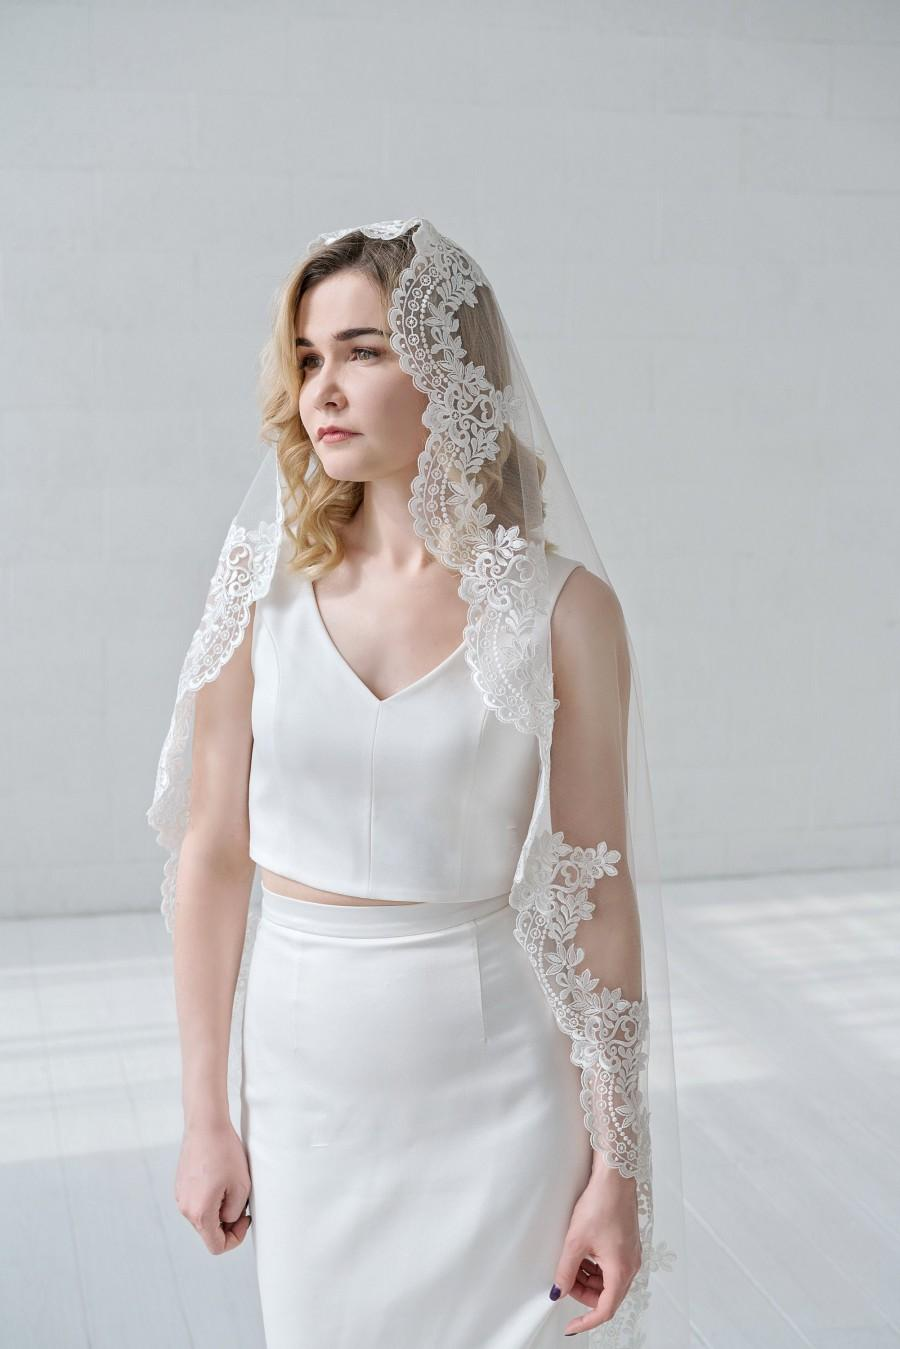 Hochzeit - Maria - mantilla veil with lace edge / lace edge veil / face framing veil / traditional bridal veil / catholic veil / ivory wedding veil